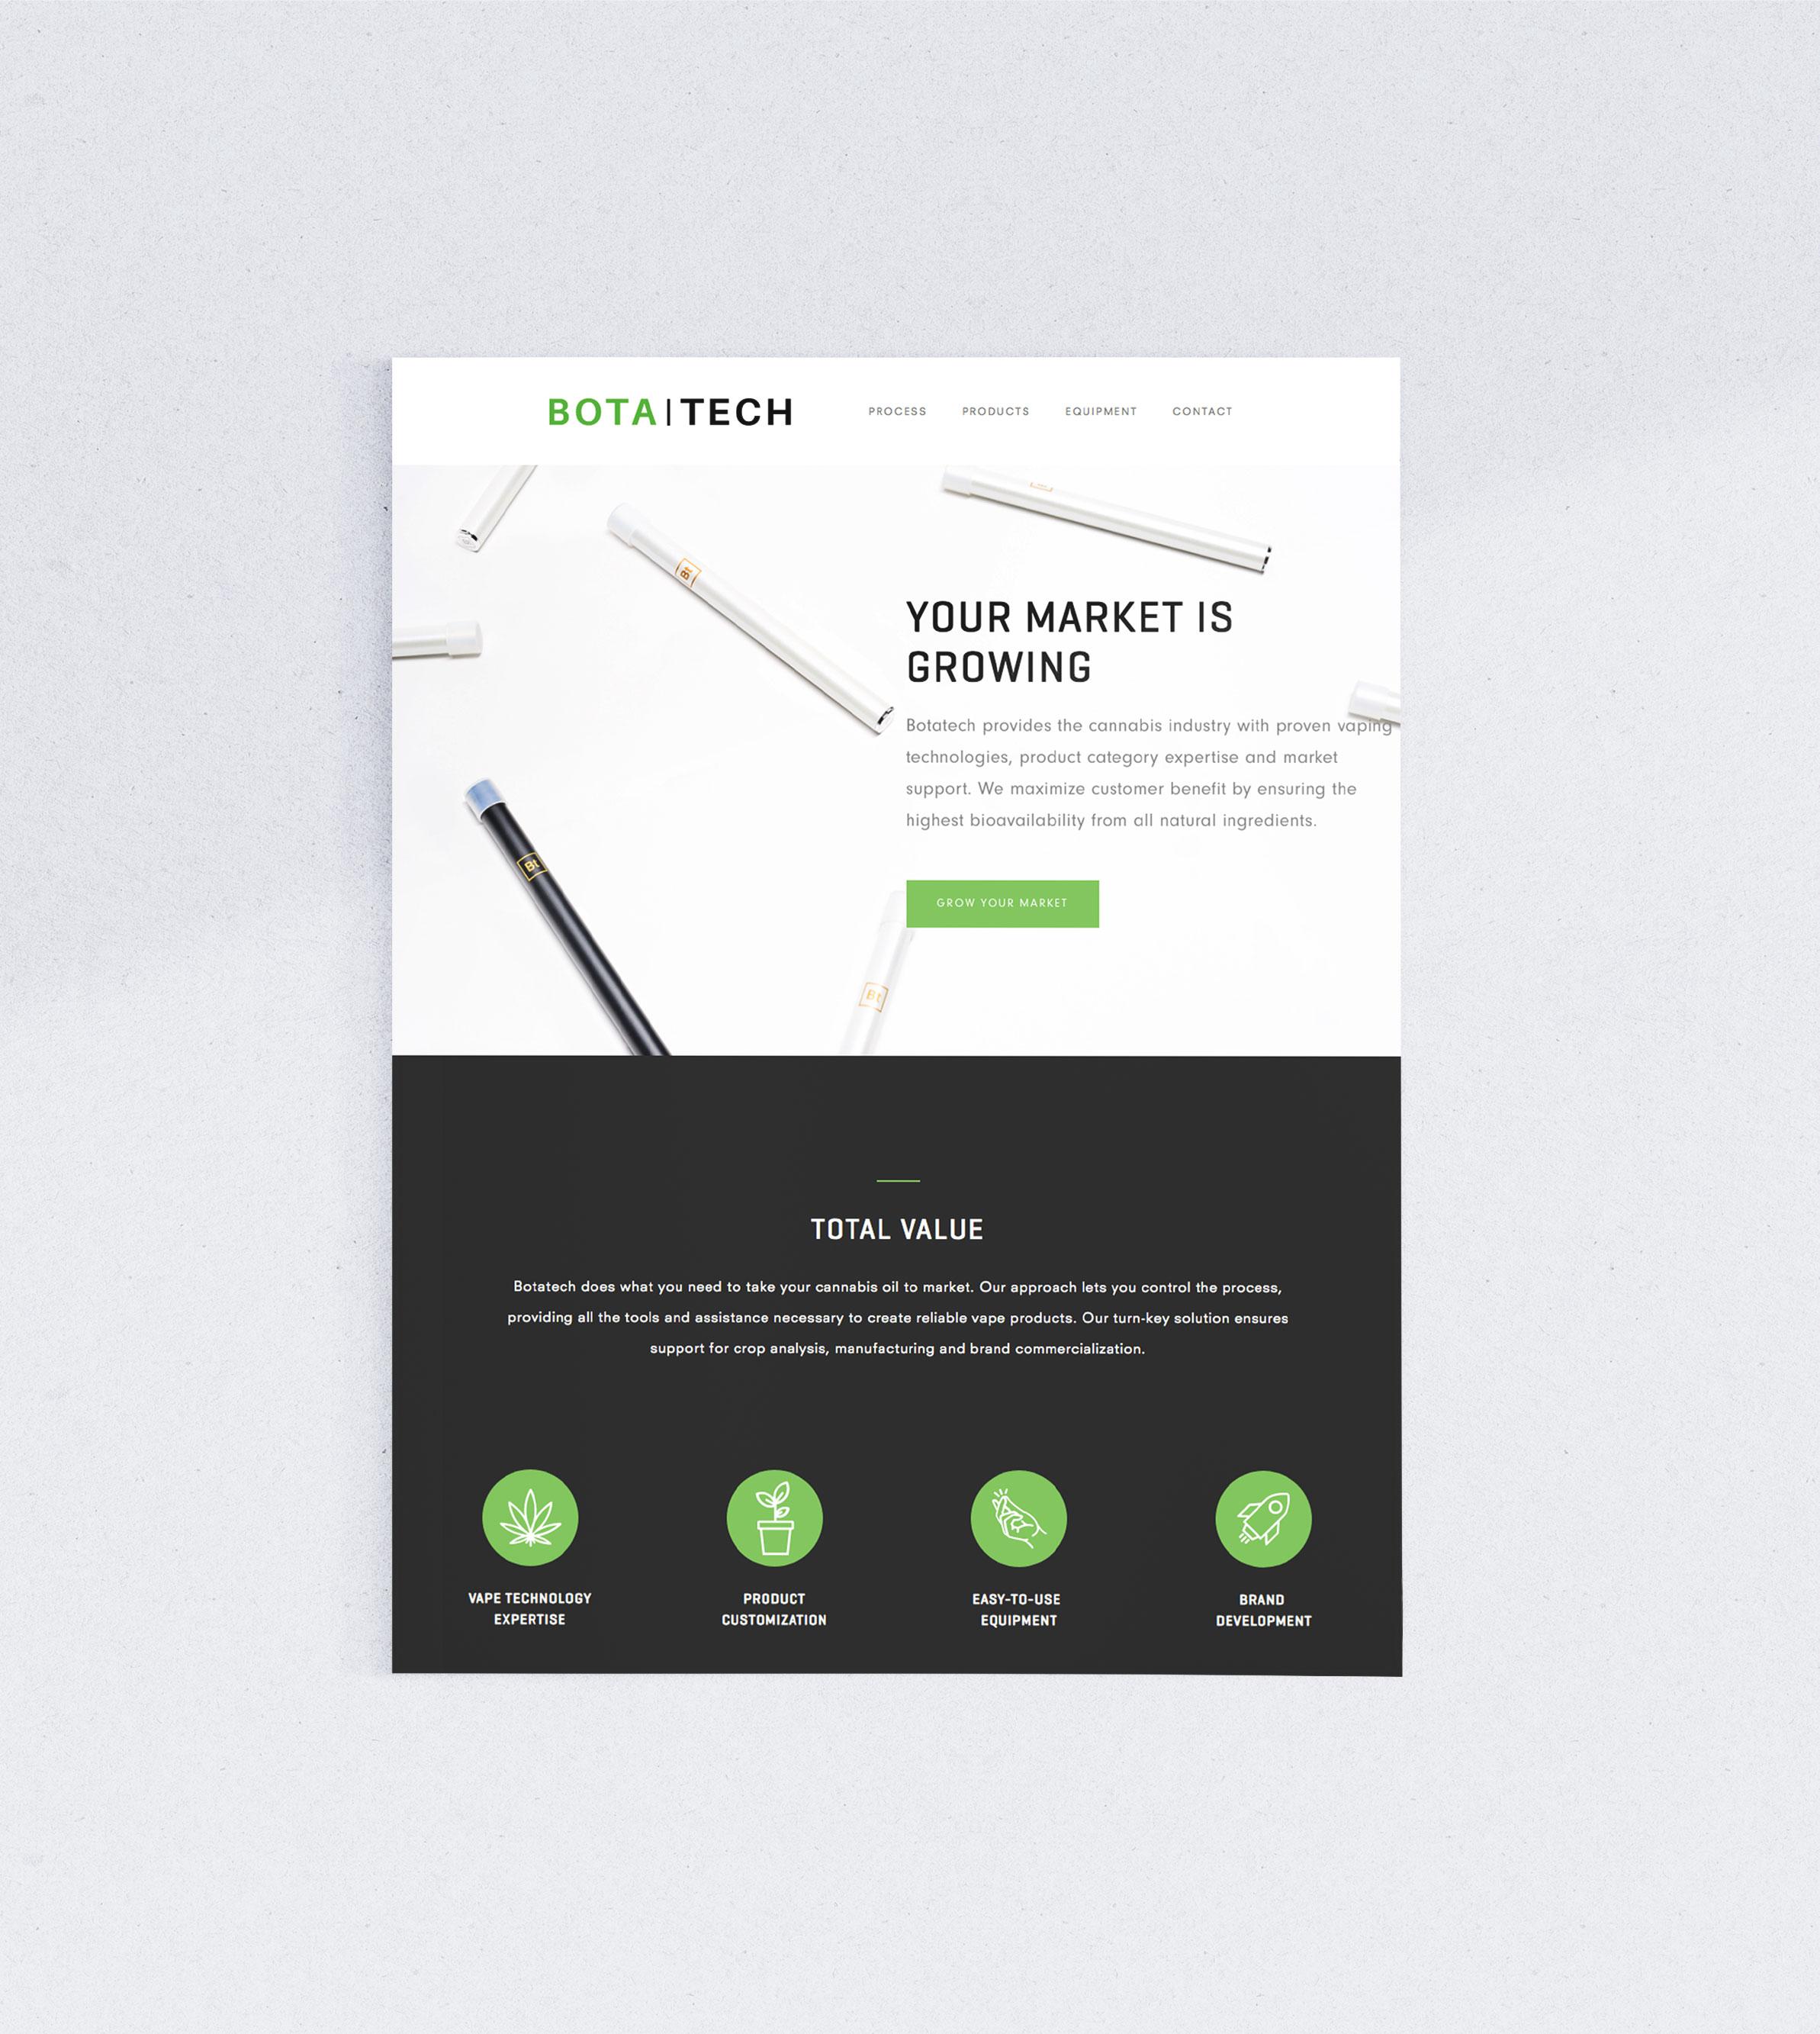 Siblings Creative Design Studio Botatech Homepage